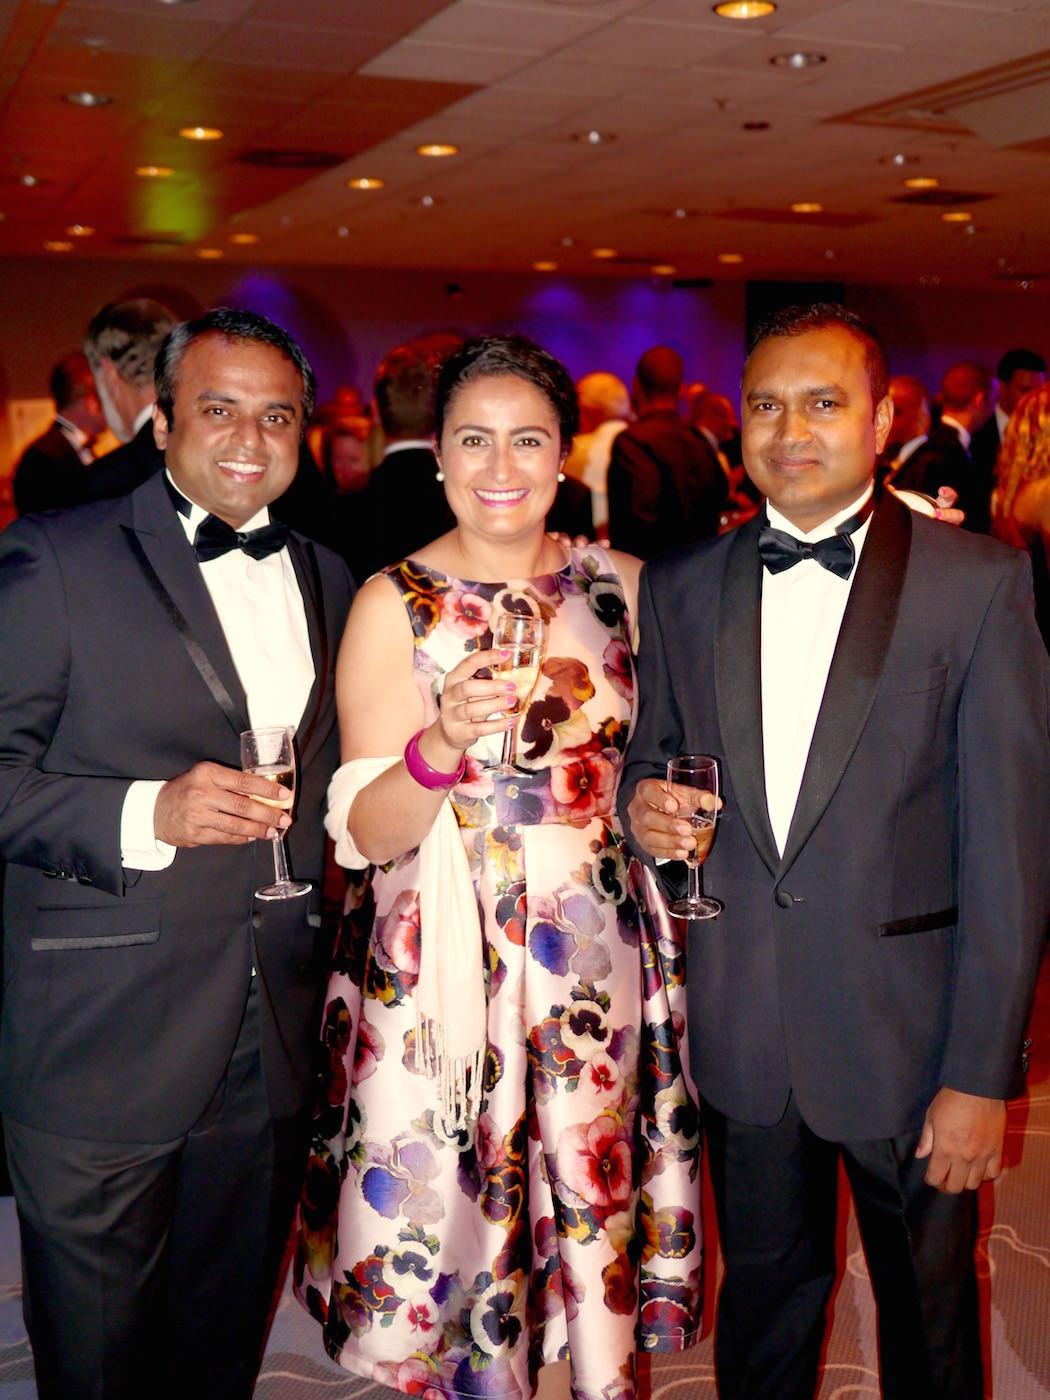 (L to R): Co-owner Kanthi Thamma, Operations Manager Rachida Zitouni & Head Chef Gouranga Bera